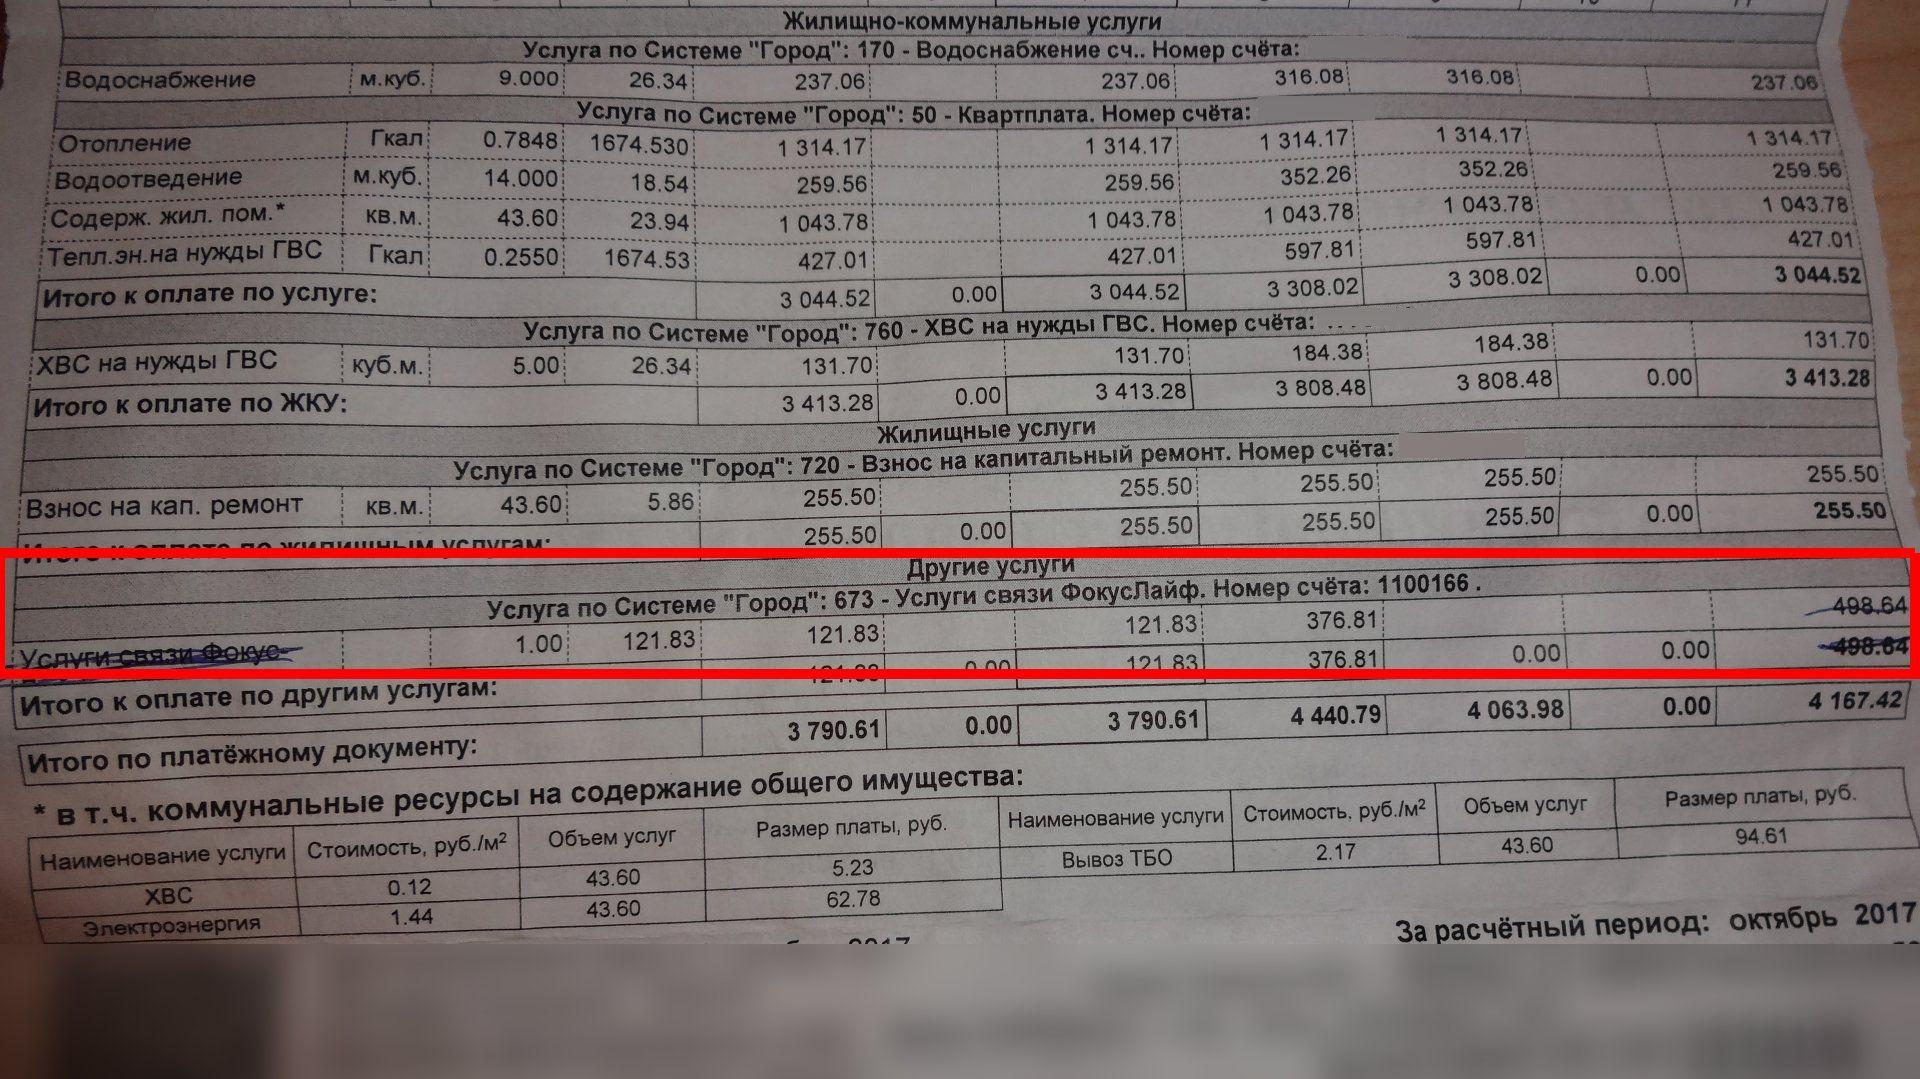 Сумма к оплате, за несуществующие услуги